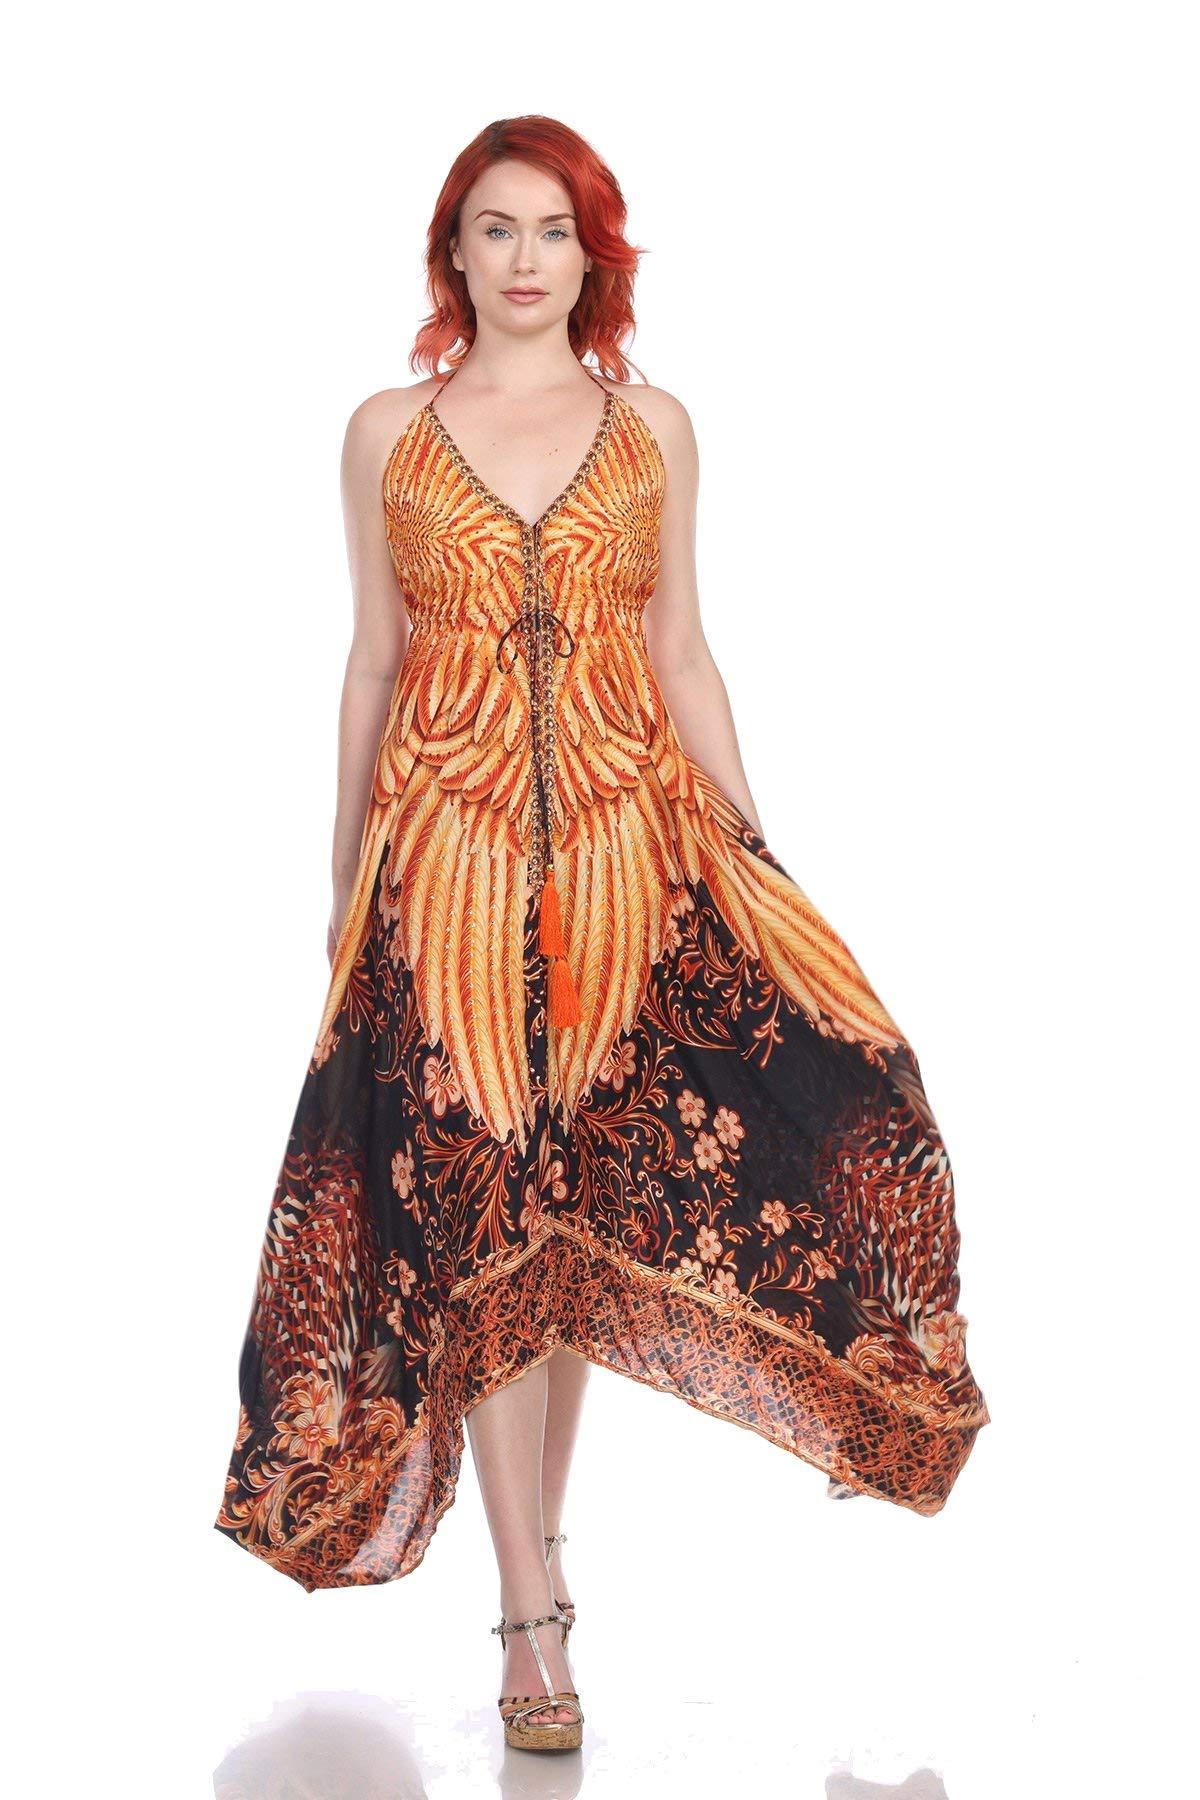 LA MODA CLOTHING Summer Beach Resort Party Cover Up Kaftan Dresses and Women's Dresses Shop Luxury Dresses